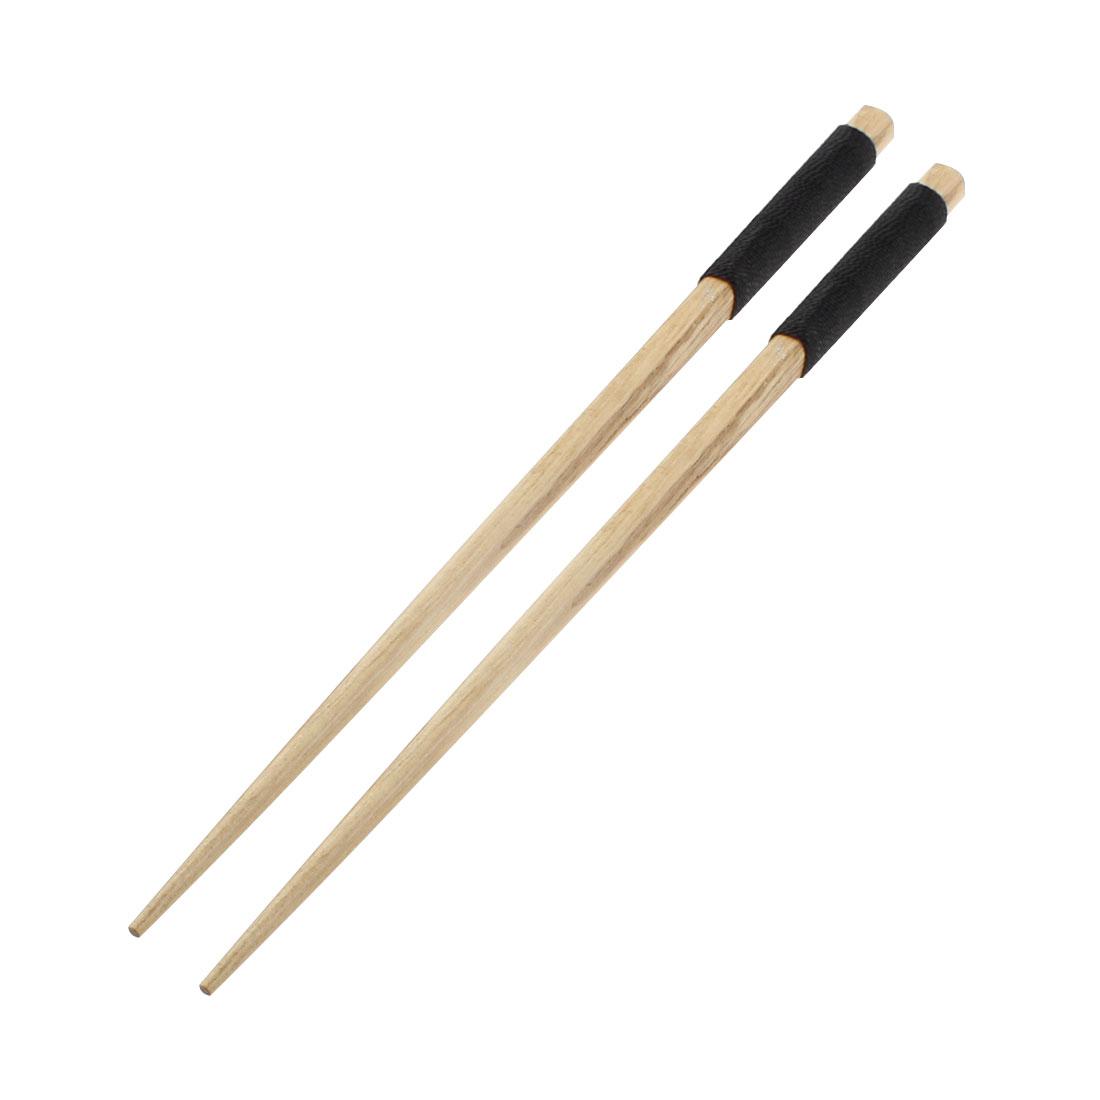 Home Kitchen Tableware Twine Nonslip Handle Wooden Chopsticks 22.5cm Long Pair